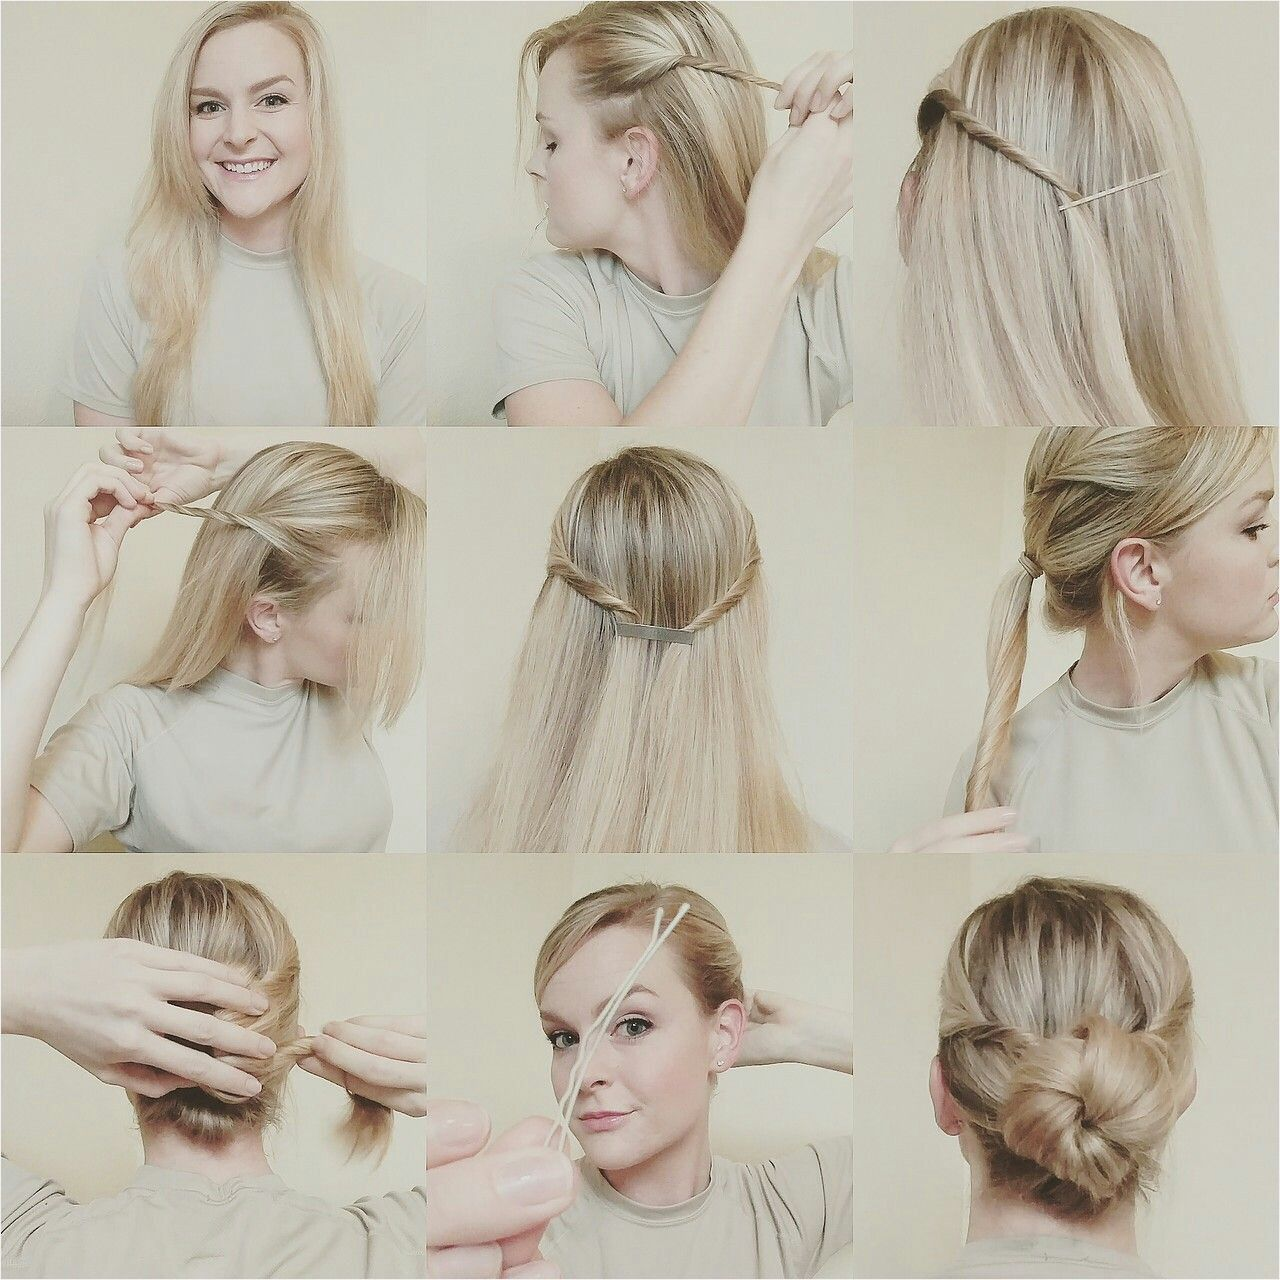 Military Hairstyles For Women Hair Styles Military Hair Hair Bun Pictures